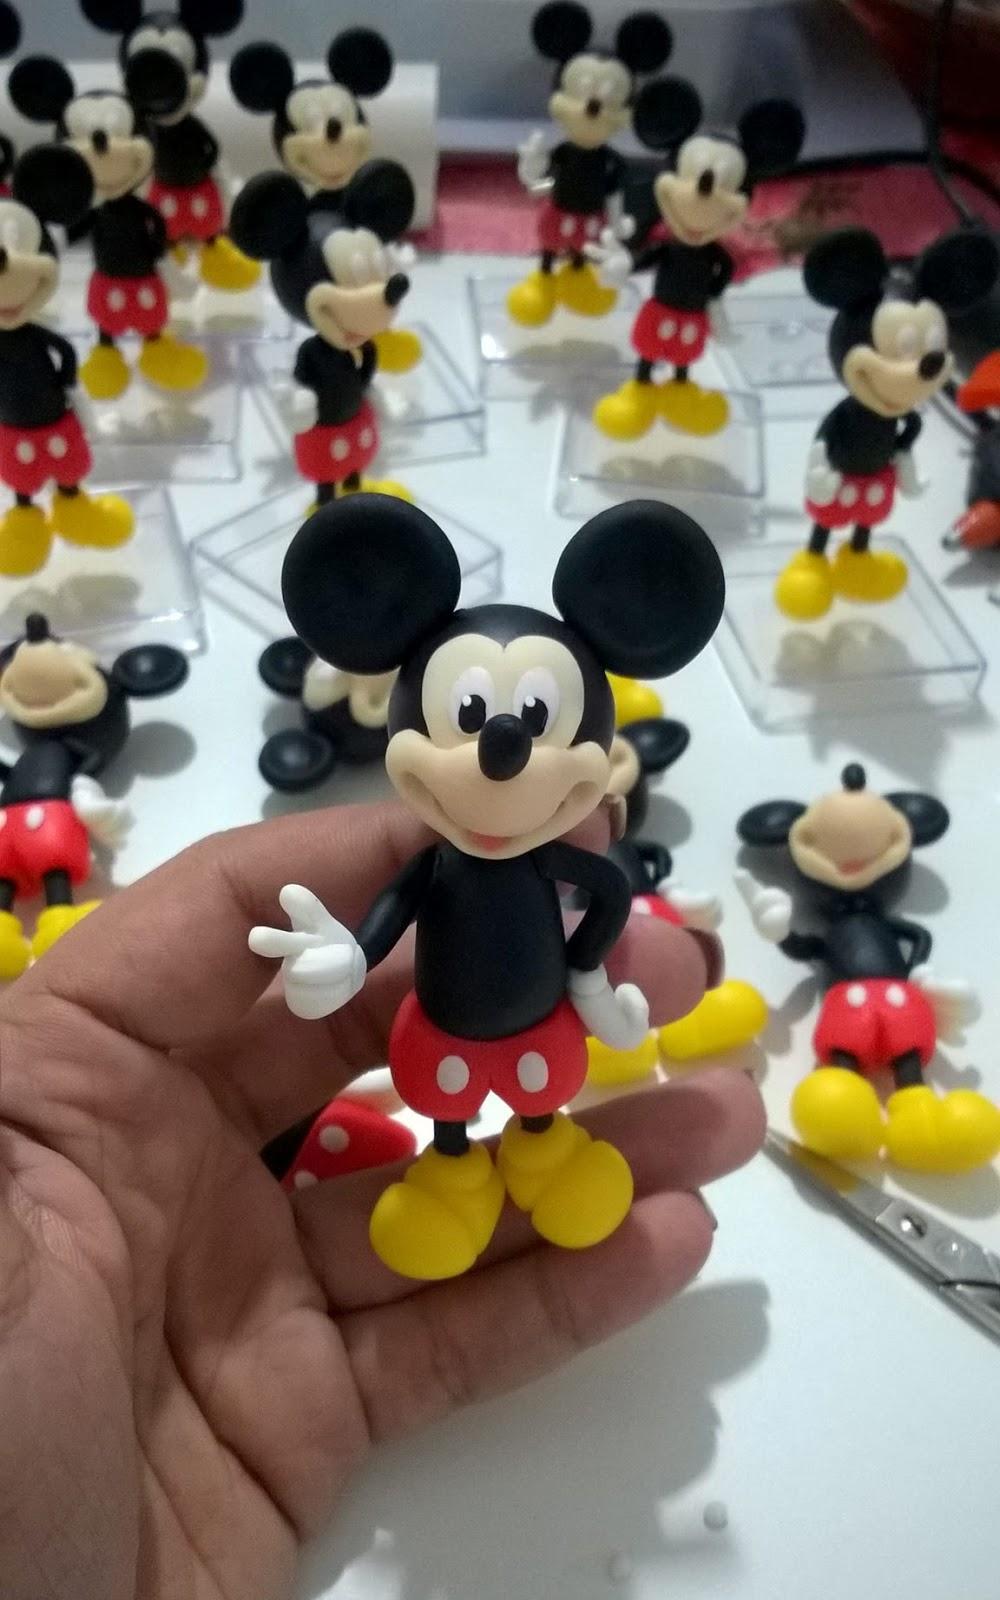 Artesanato Brasil Maringa ~ Ana Biscuit Artesanato em Biscuit S u00e3o Gonçalo, Niterói e Rio de Janeiro Mickey de biscuit